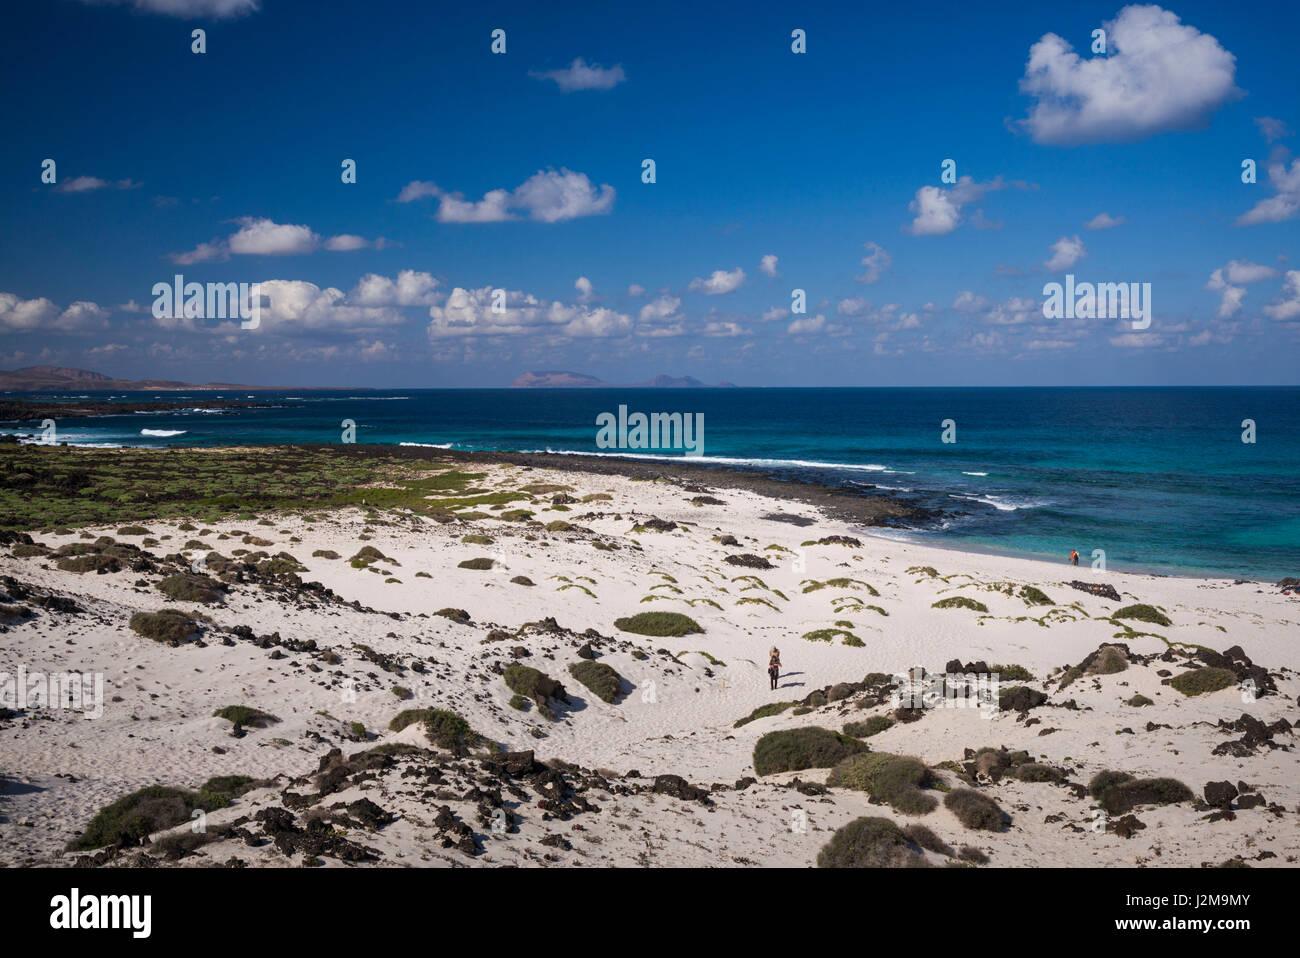 Canary Islands Tourism Paper